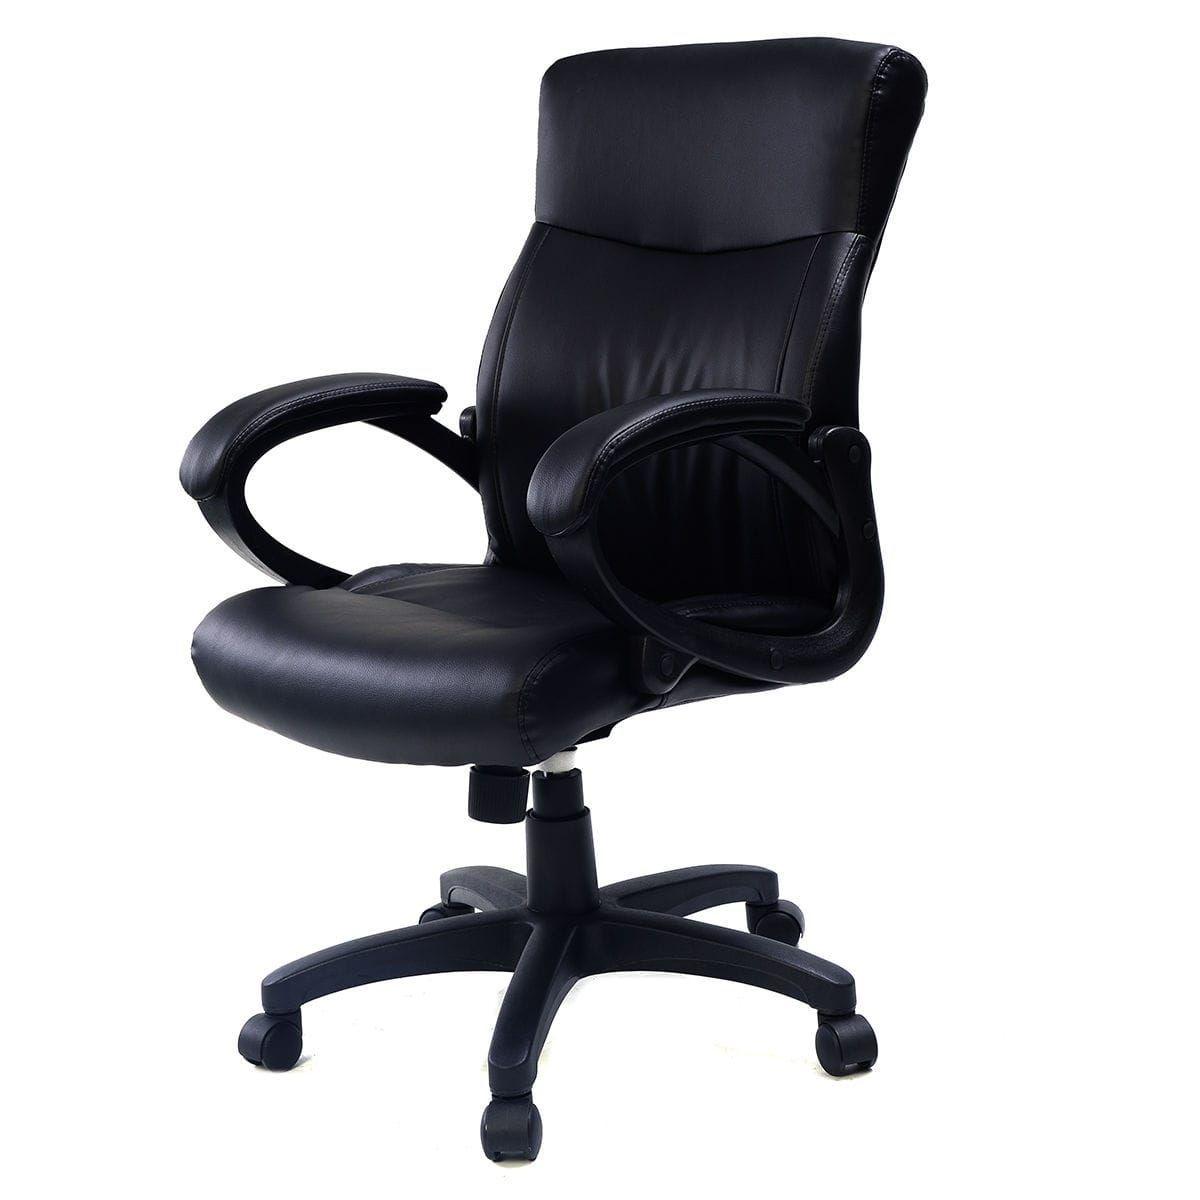 Costway 2016 style pu leather ergonomic computer desk task